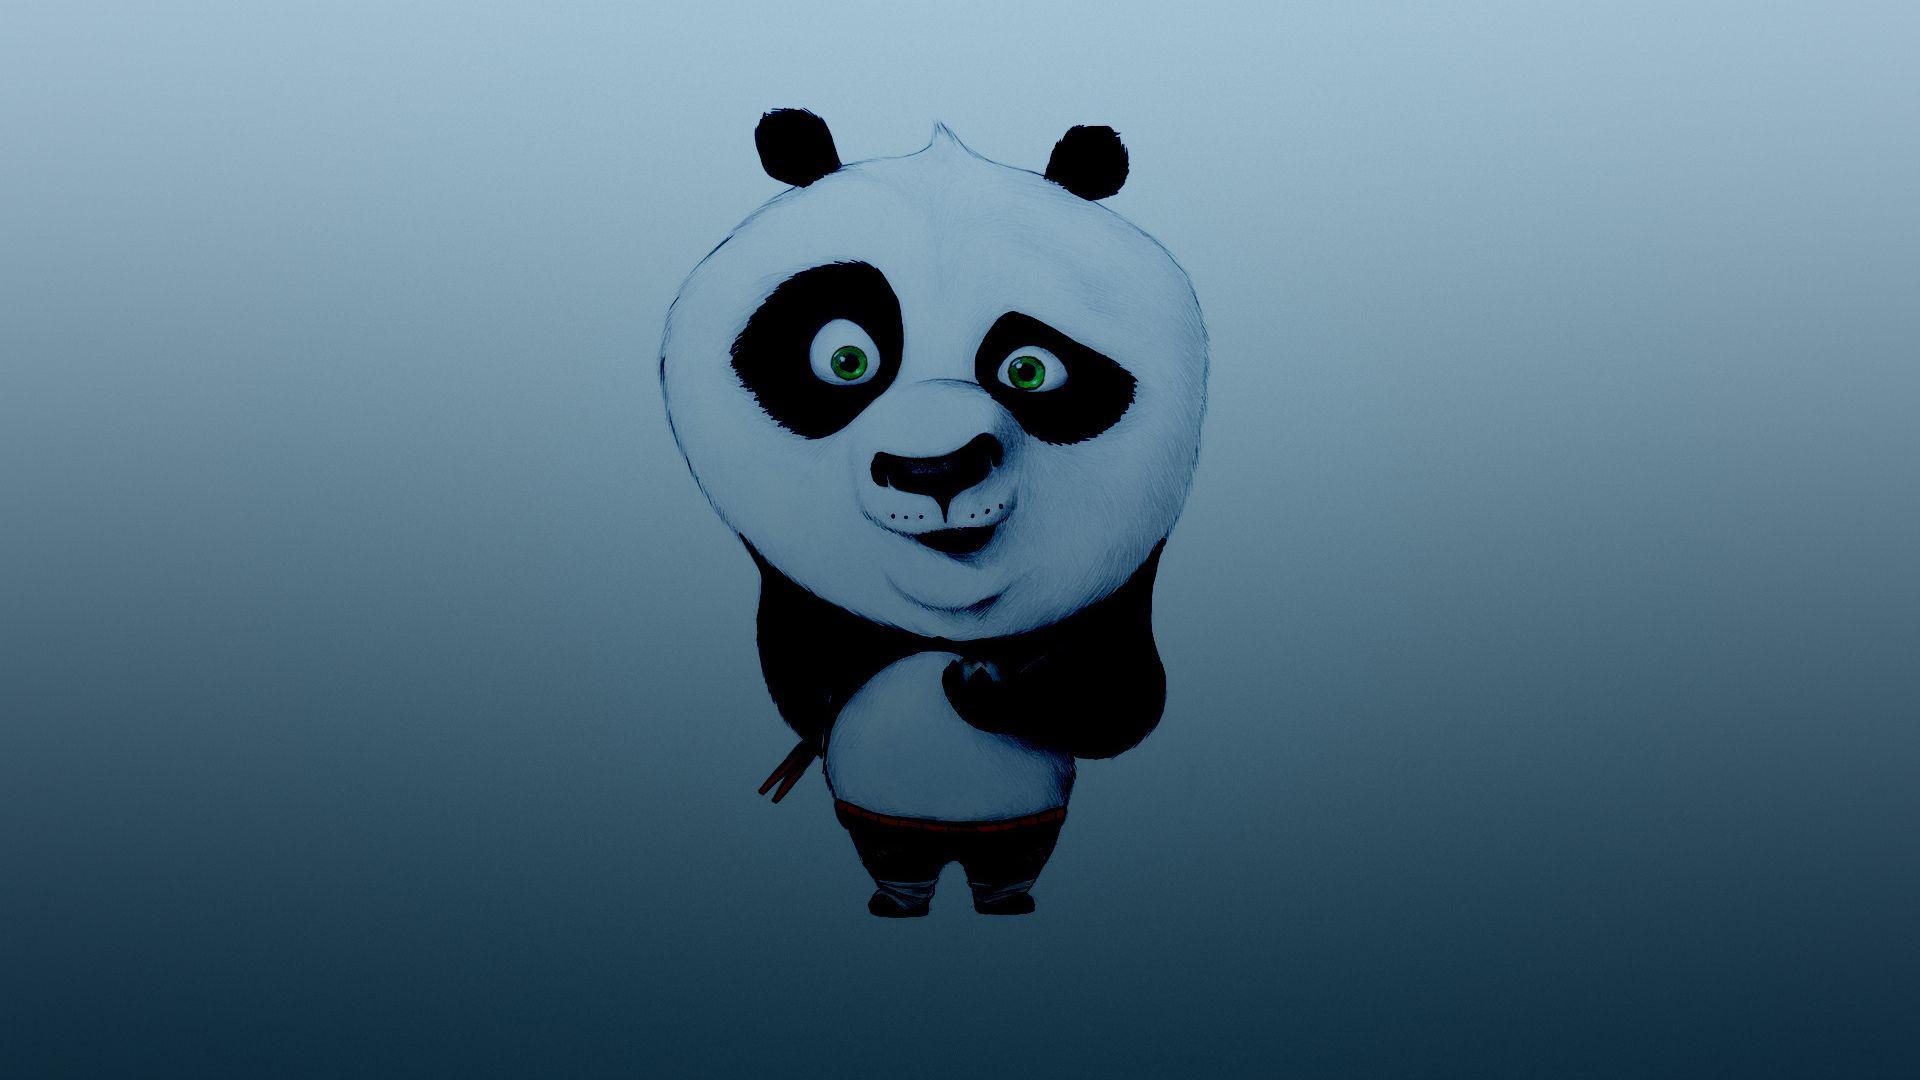 Sticks, Kungfu Panda, Kung Fu Panda Wallpaper For Your Desktop